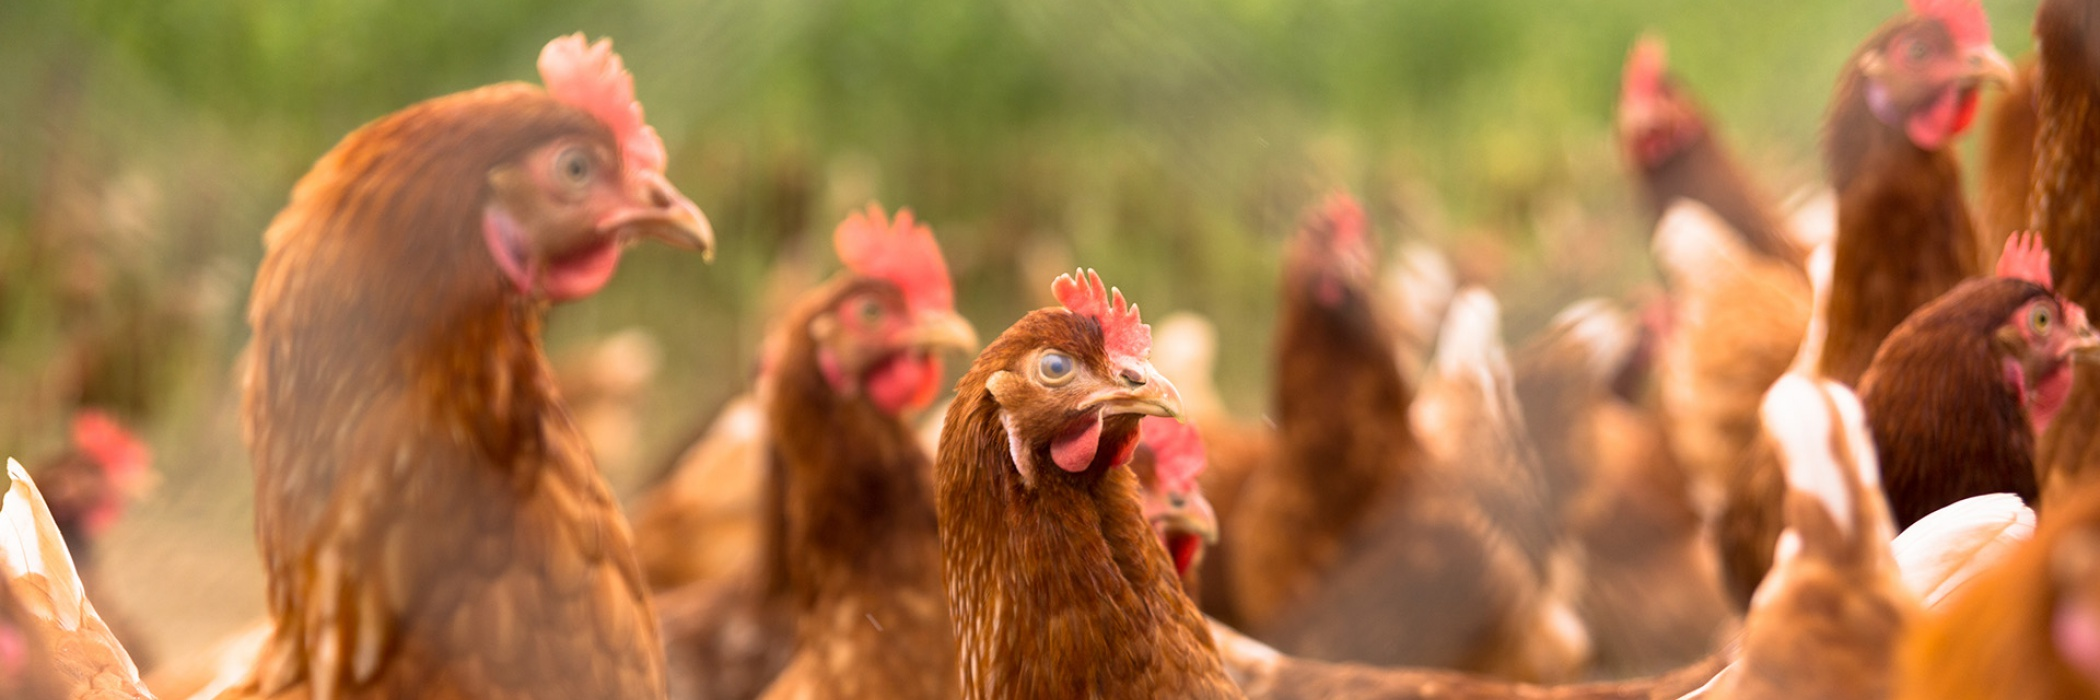 galline in gruppo